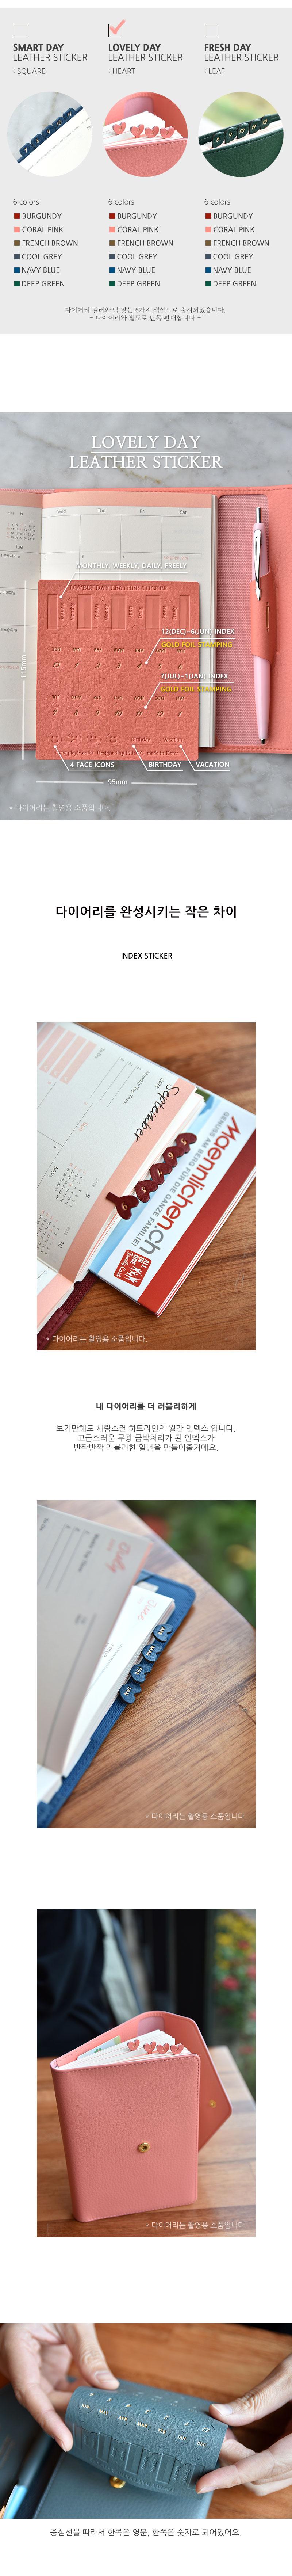 Lovely Day Leather Sticker - 플레픽, 4,950원, 스티커, 인덱스스티커